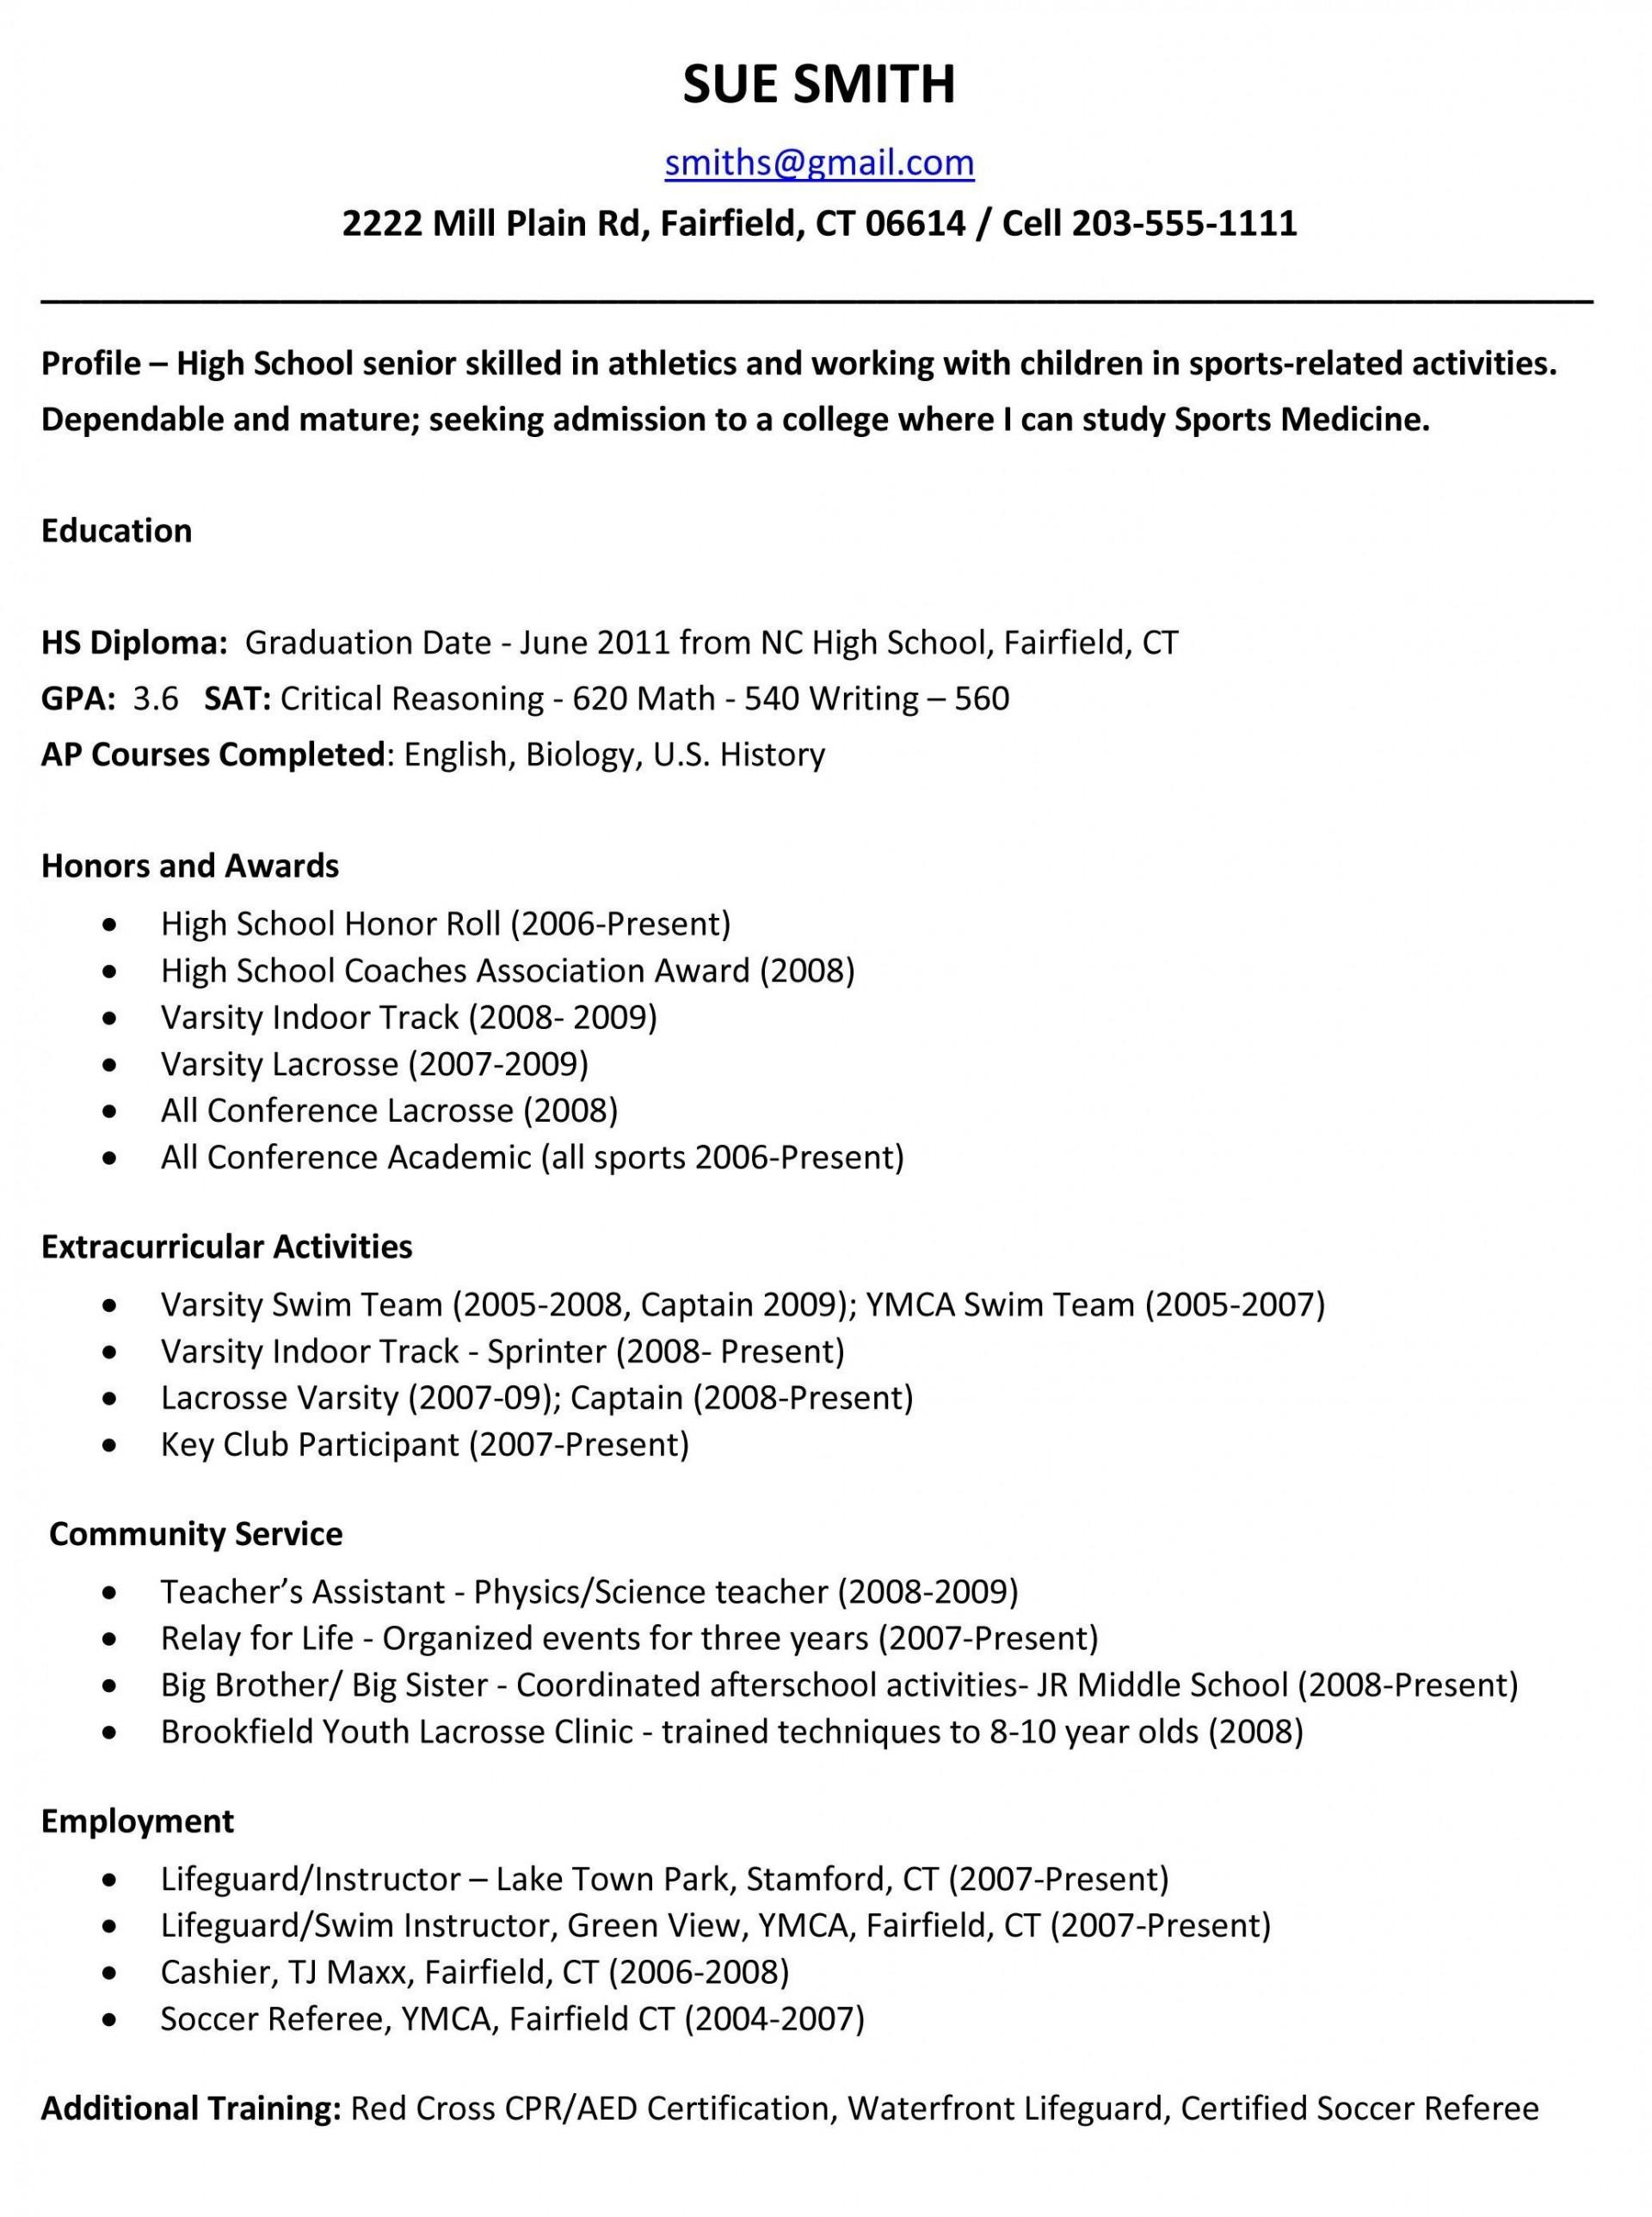 004 Astounding High School Student Resume Template Idea  Free Microsoft Word 20101920